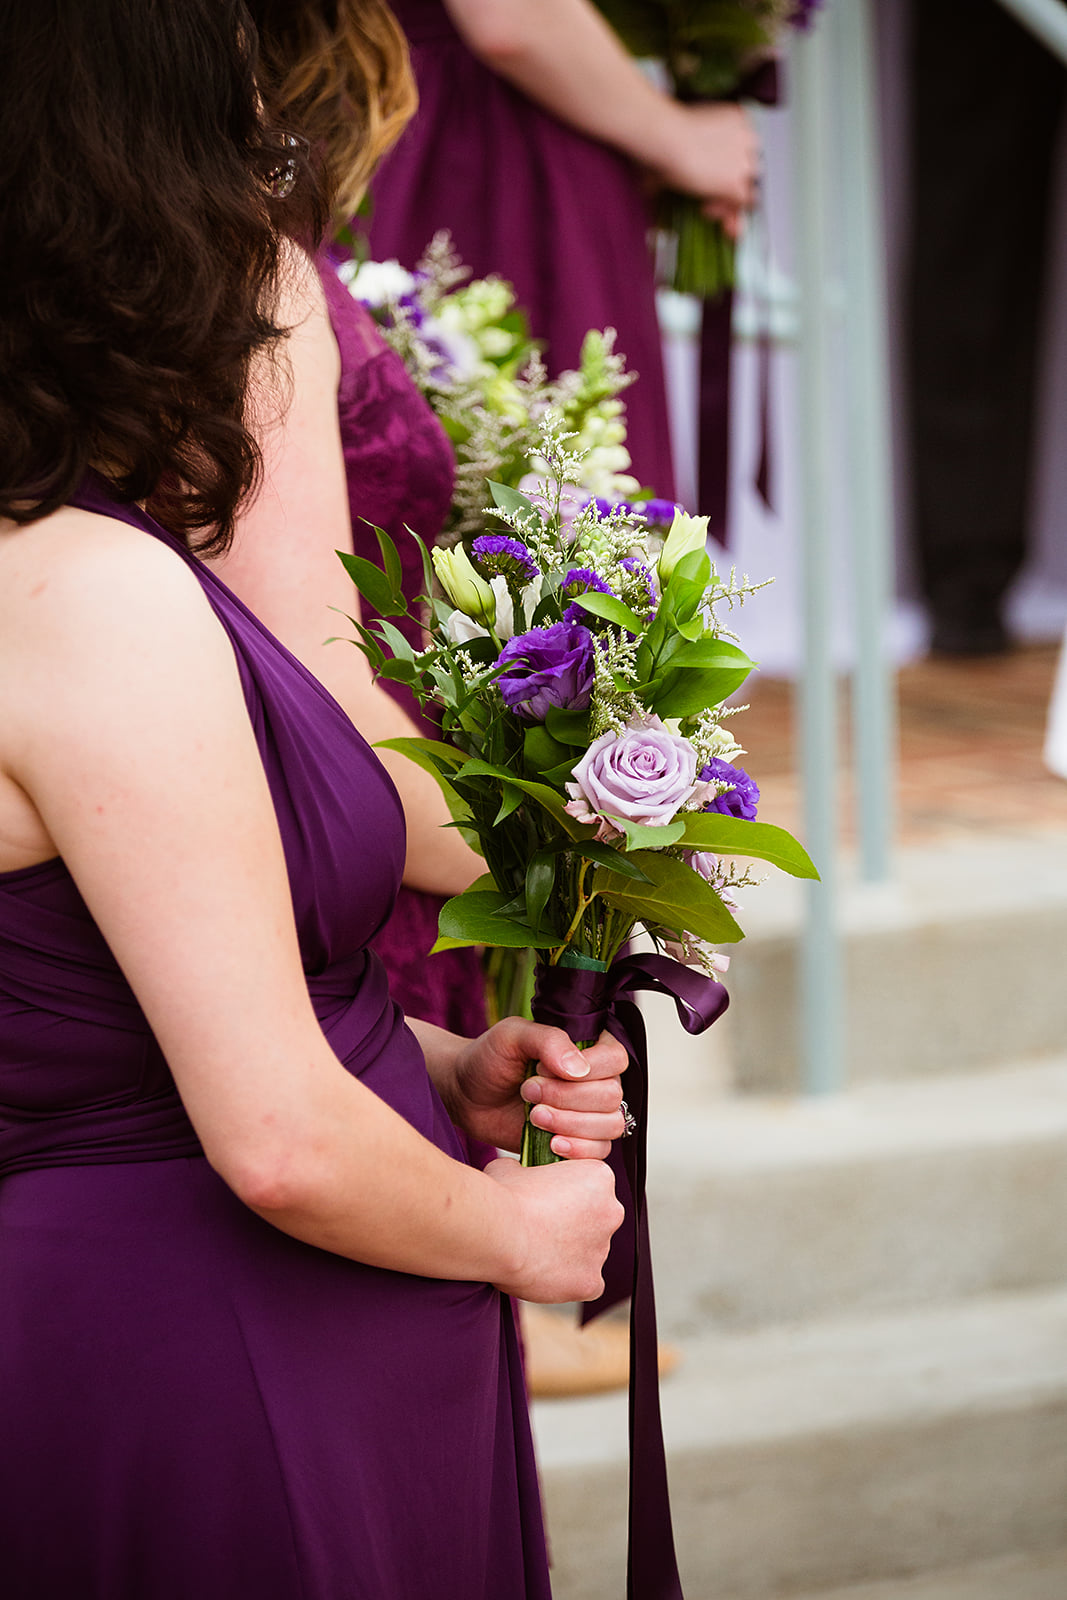 Blacano Wedding - Ceremony-25.jpg